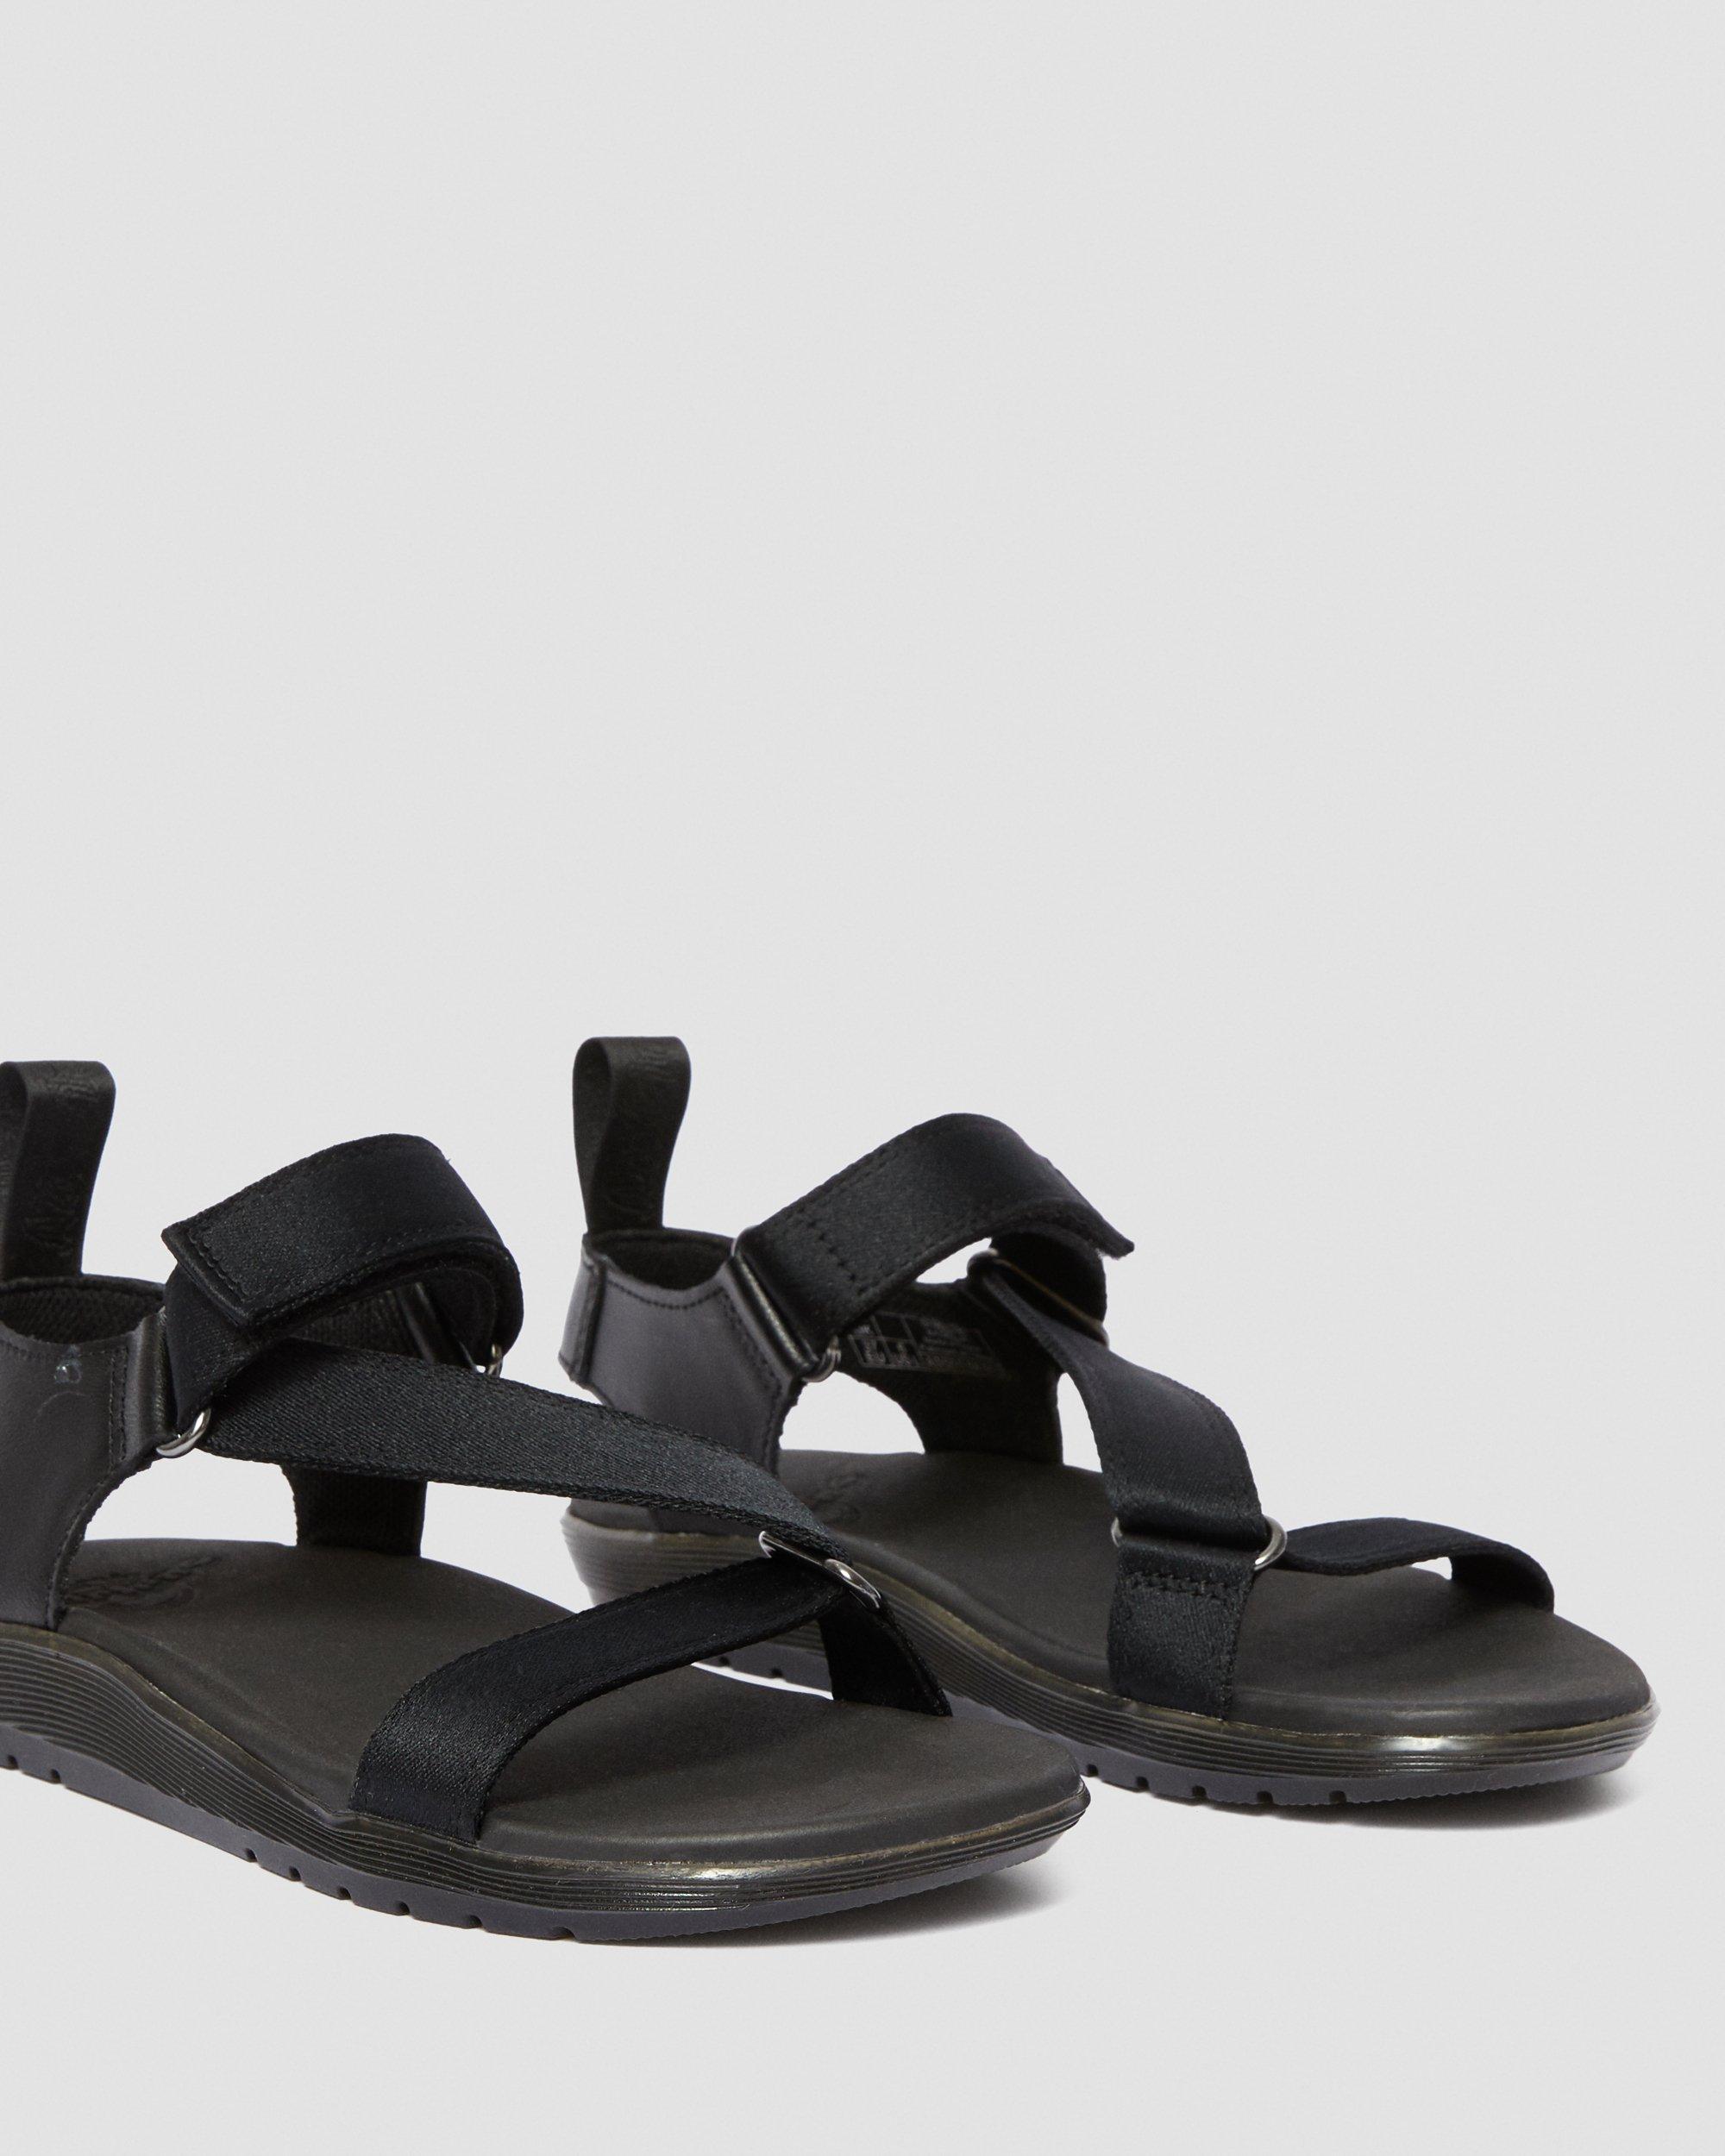 dr martens balfour sandal review, Dr.Martens VEGAN 2976